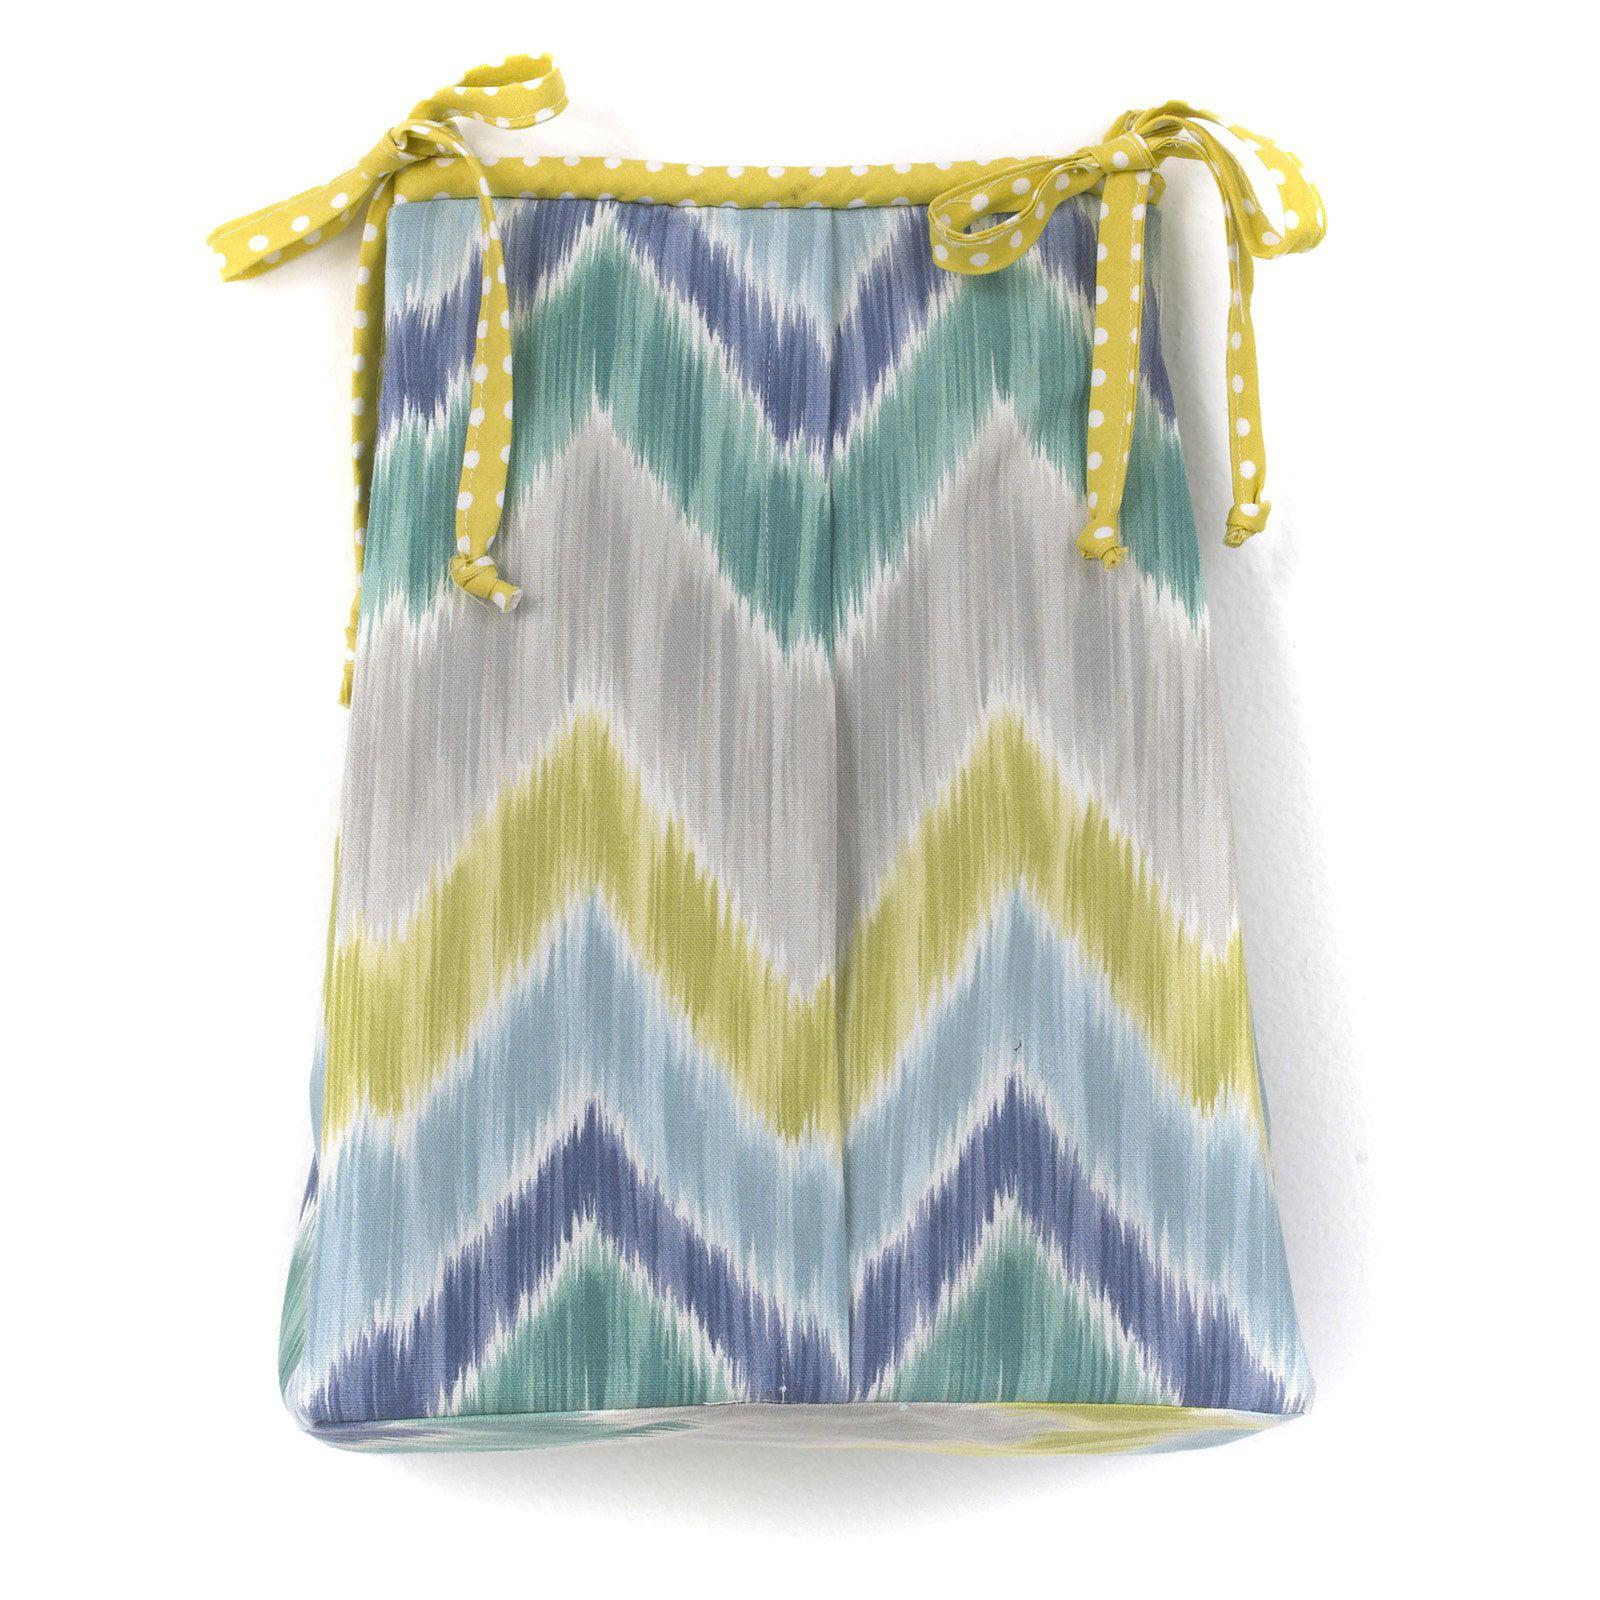 Cotton Tale Designs Zebra Romp Diaper Stacker by Cotton Tale Designs